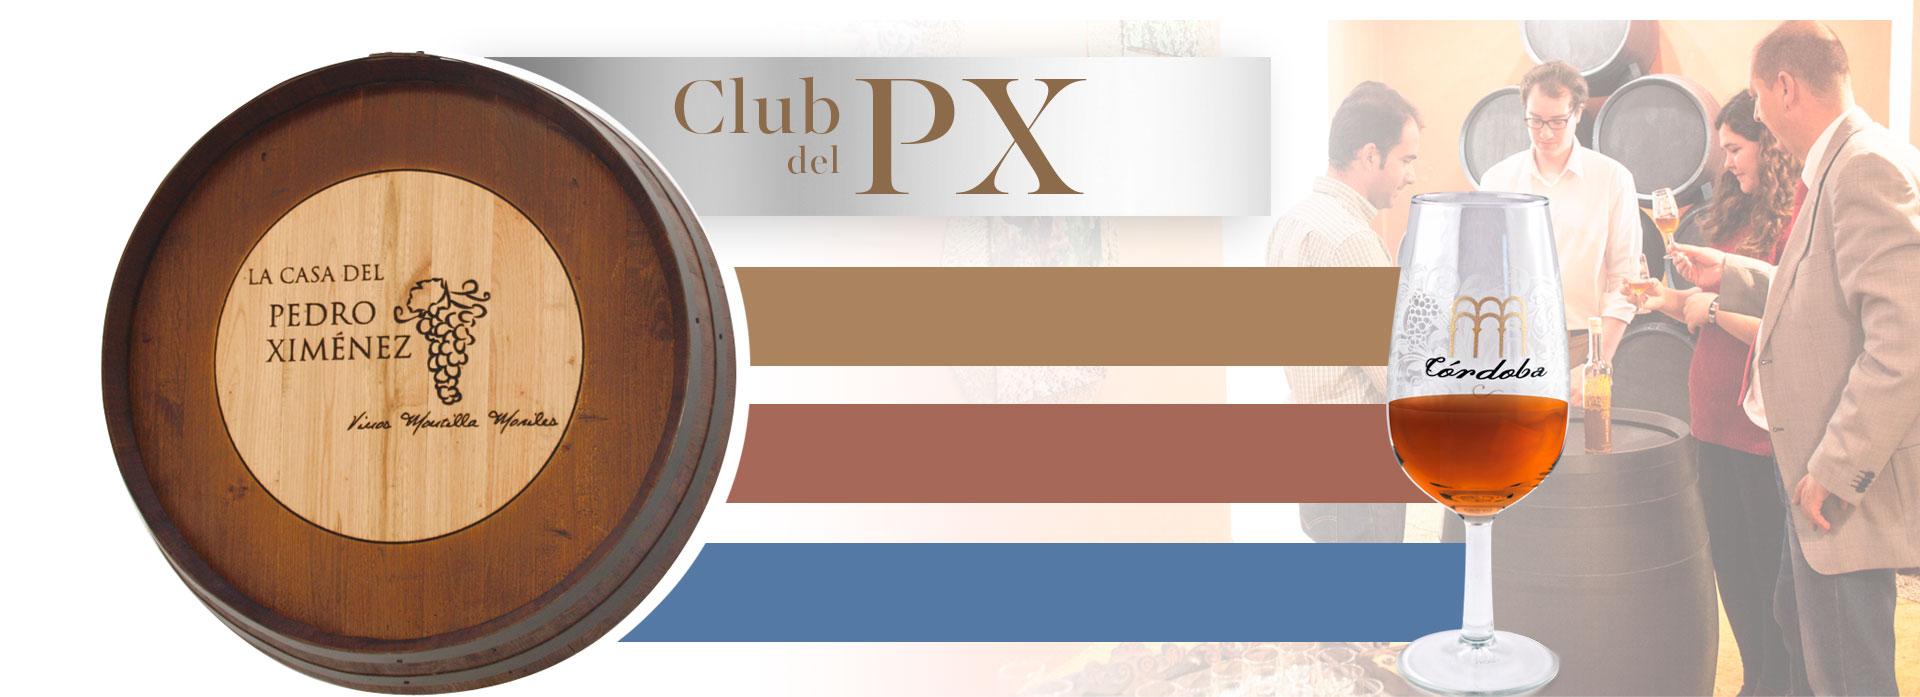 Club del PX